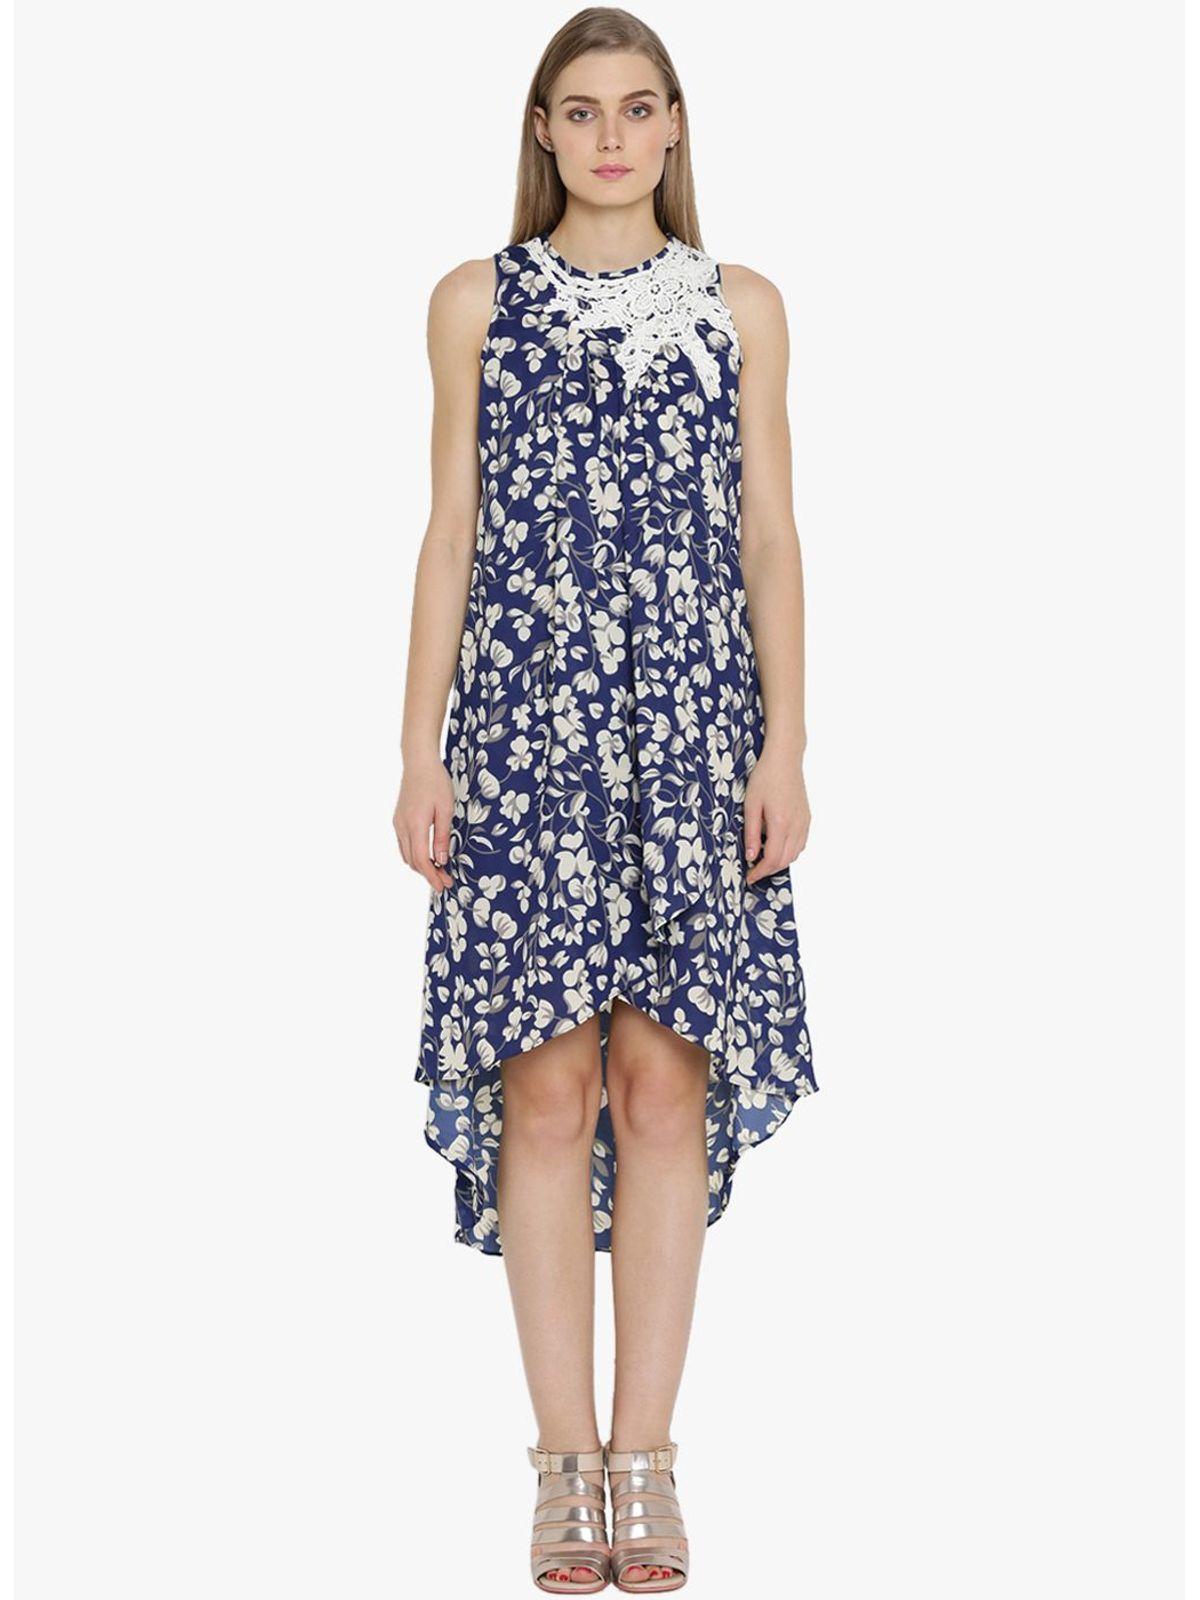 LUCY LAYERED DRESS